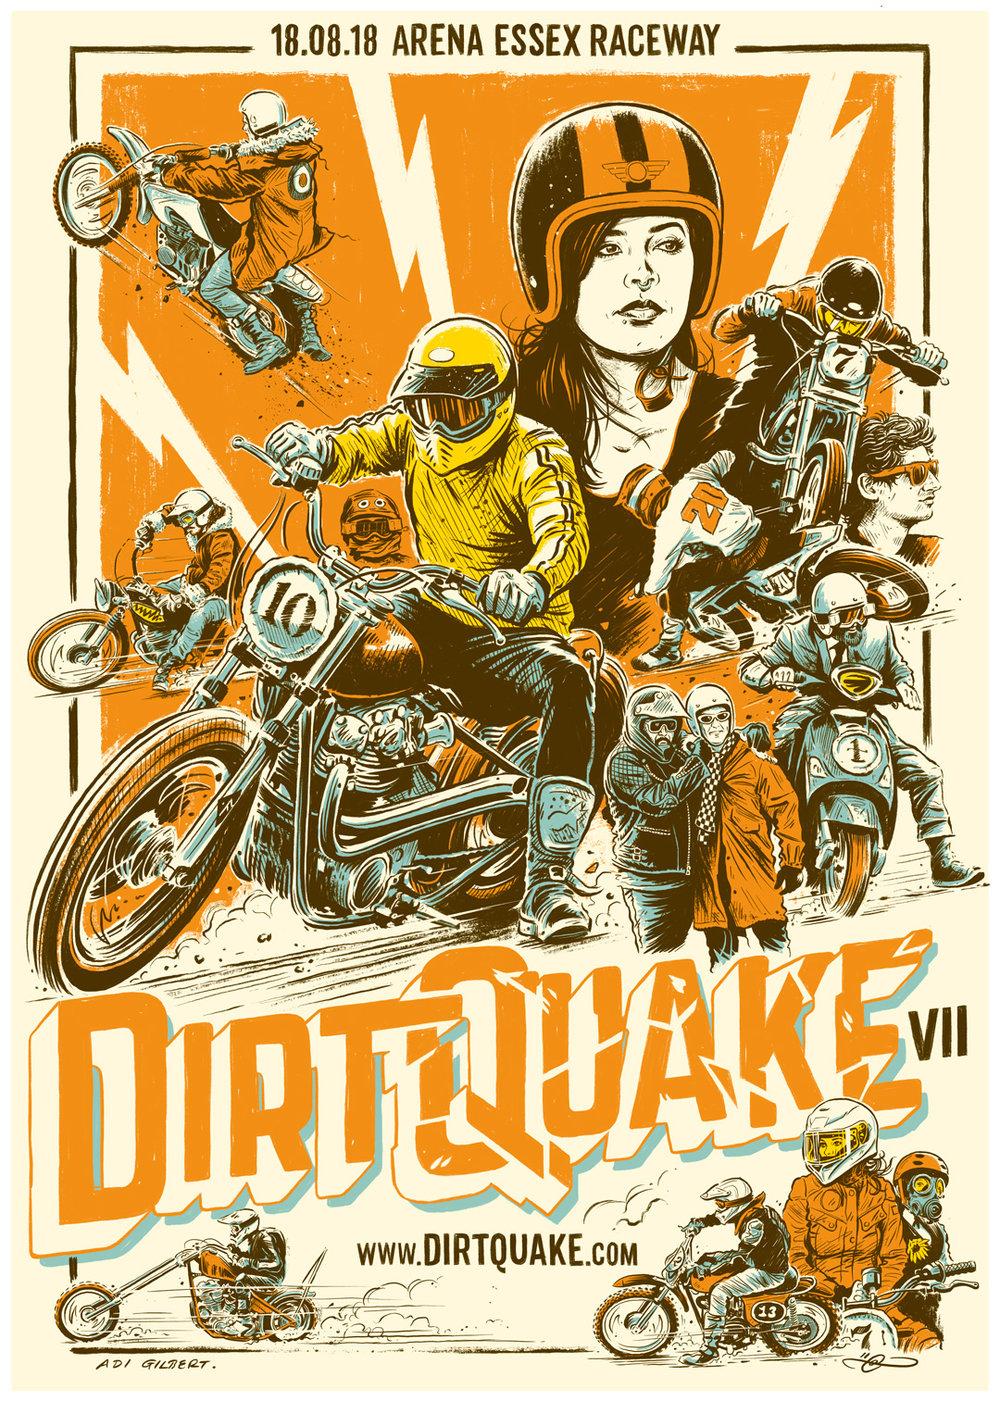 DIRTQUAKE_VII_poster_v5_web.jpg